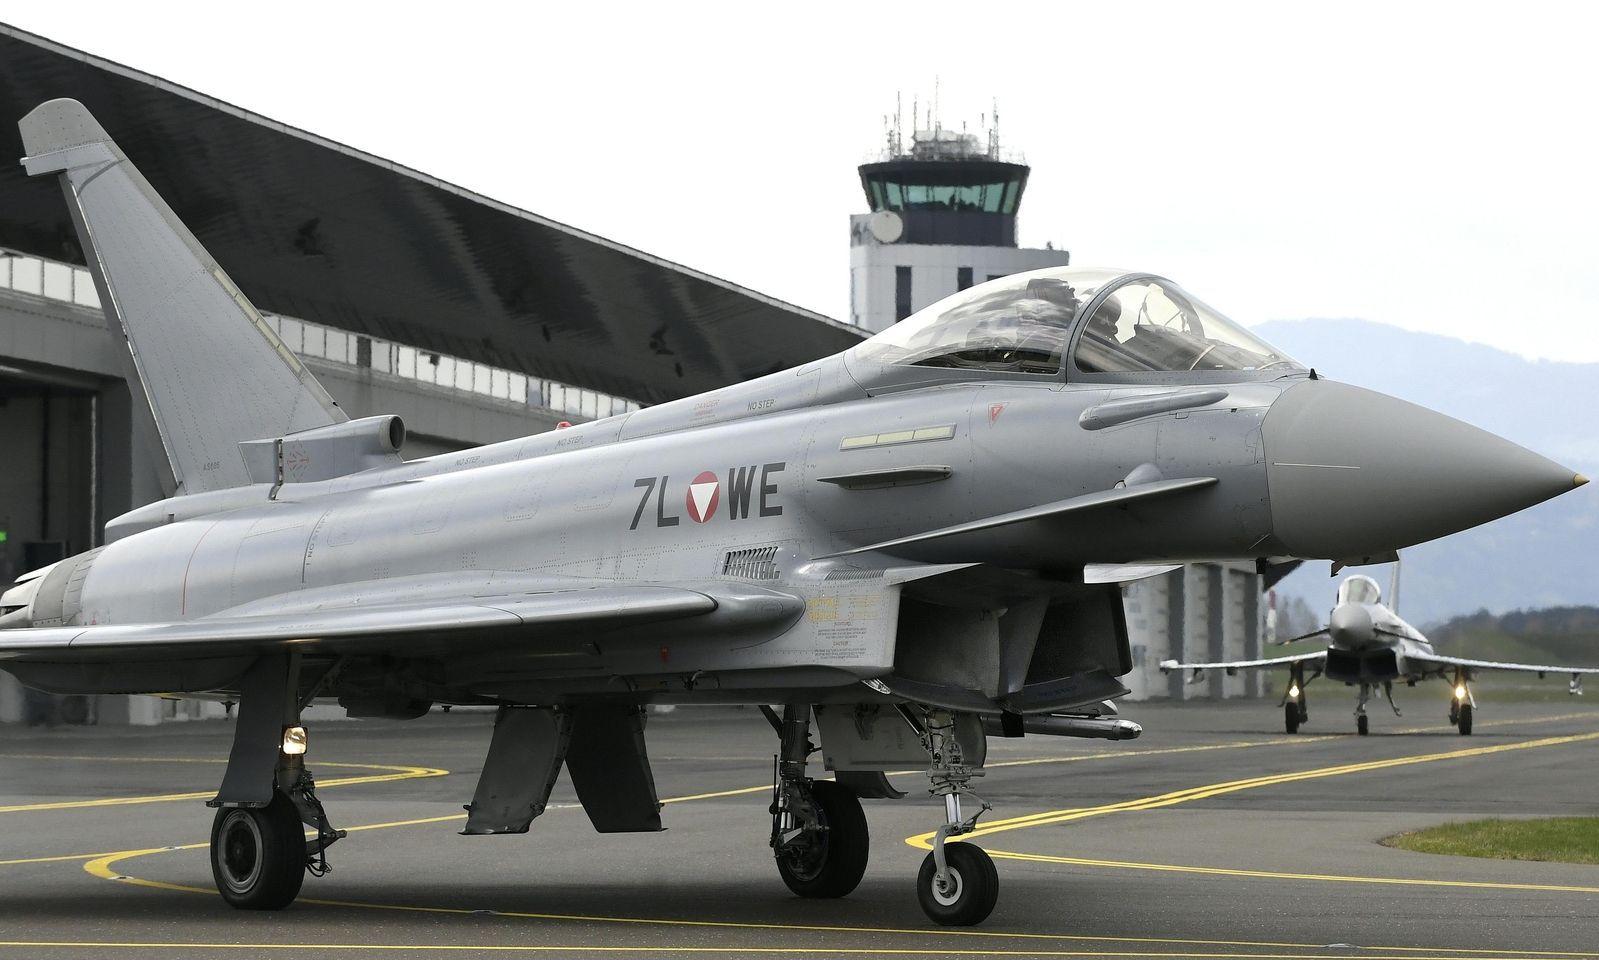 5th gen light mulltirole fighter/Mikoyan LMFS - Page 24 F4B64E2D-0EB9-4EEC-8787-AC78470C5173_v0_l